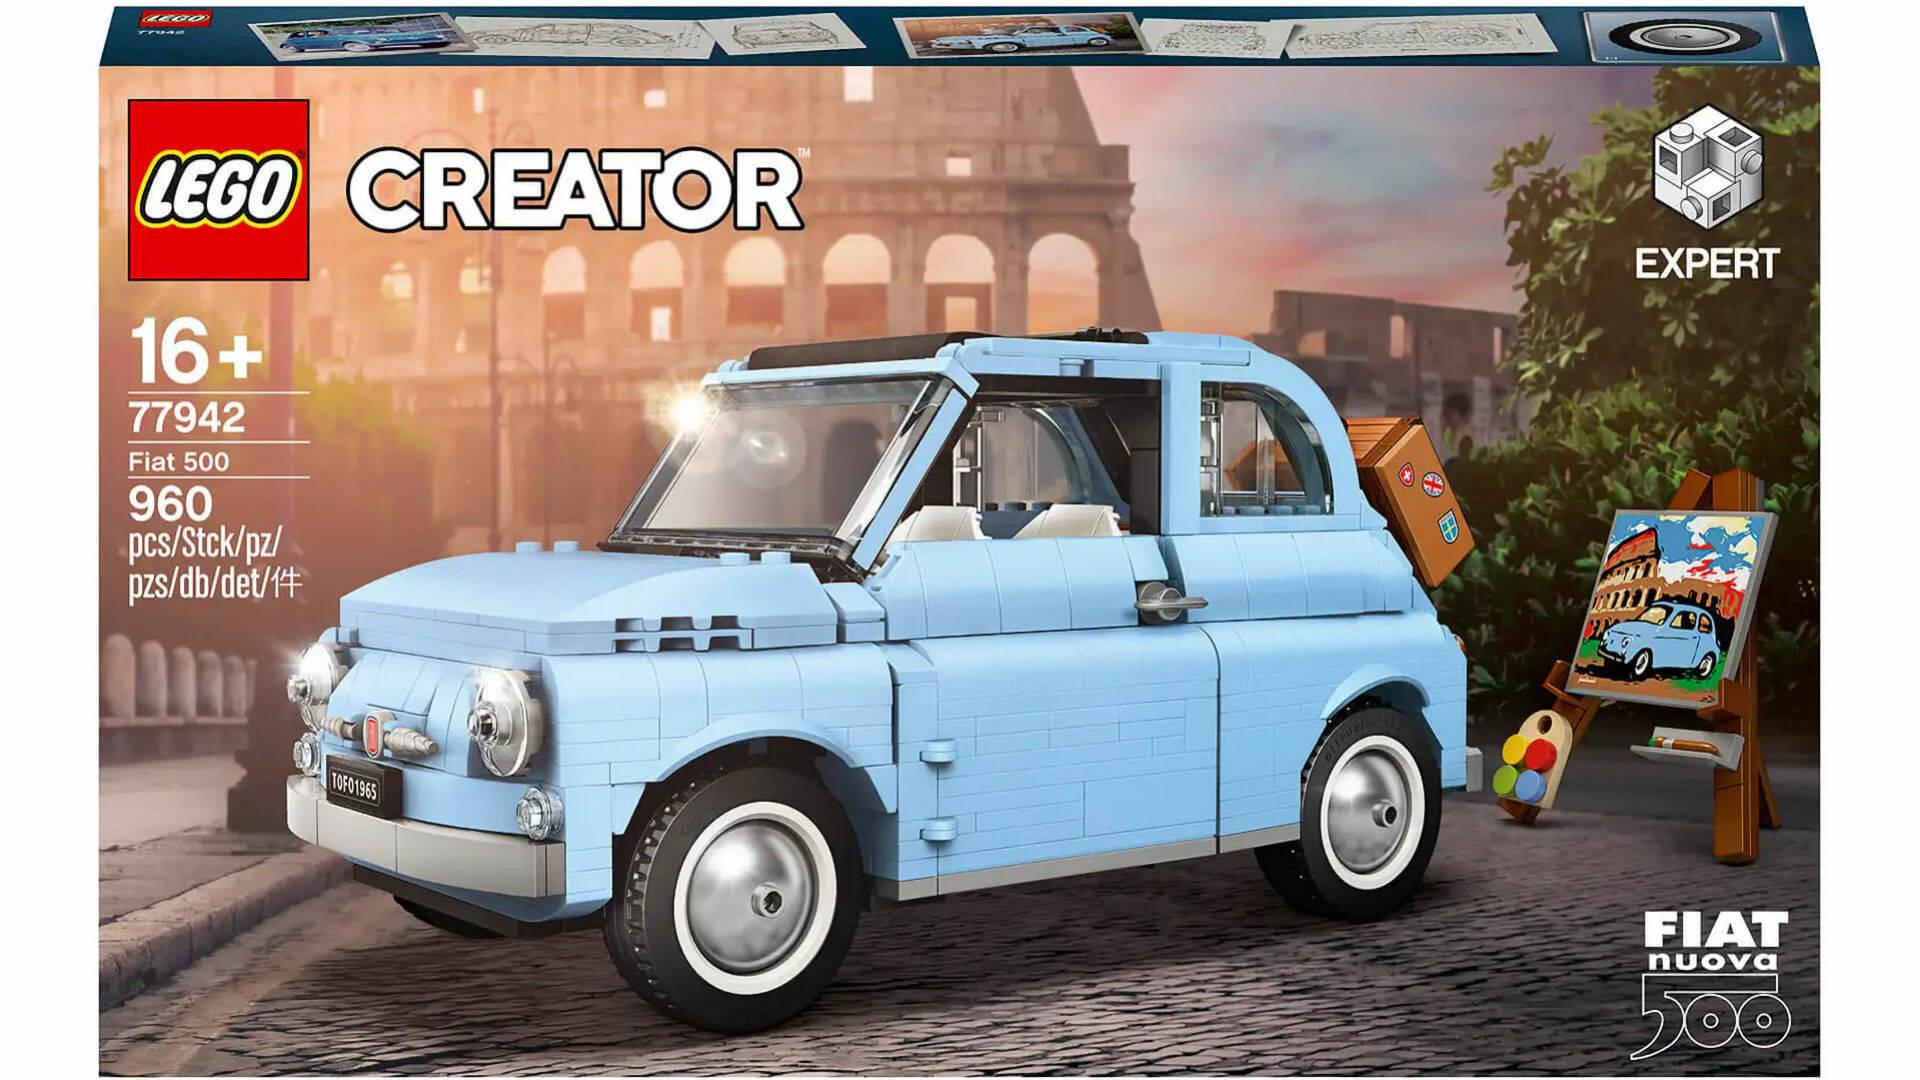 LEGO CREATOR EXPERT FIAT 500 AZZURRA SU ZAVVI